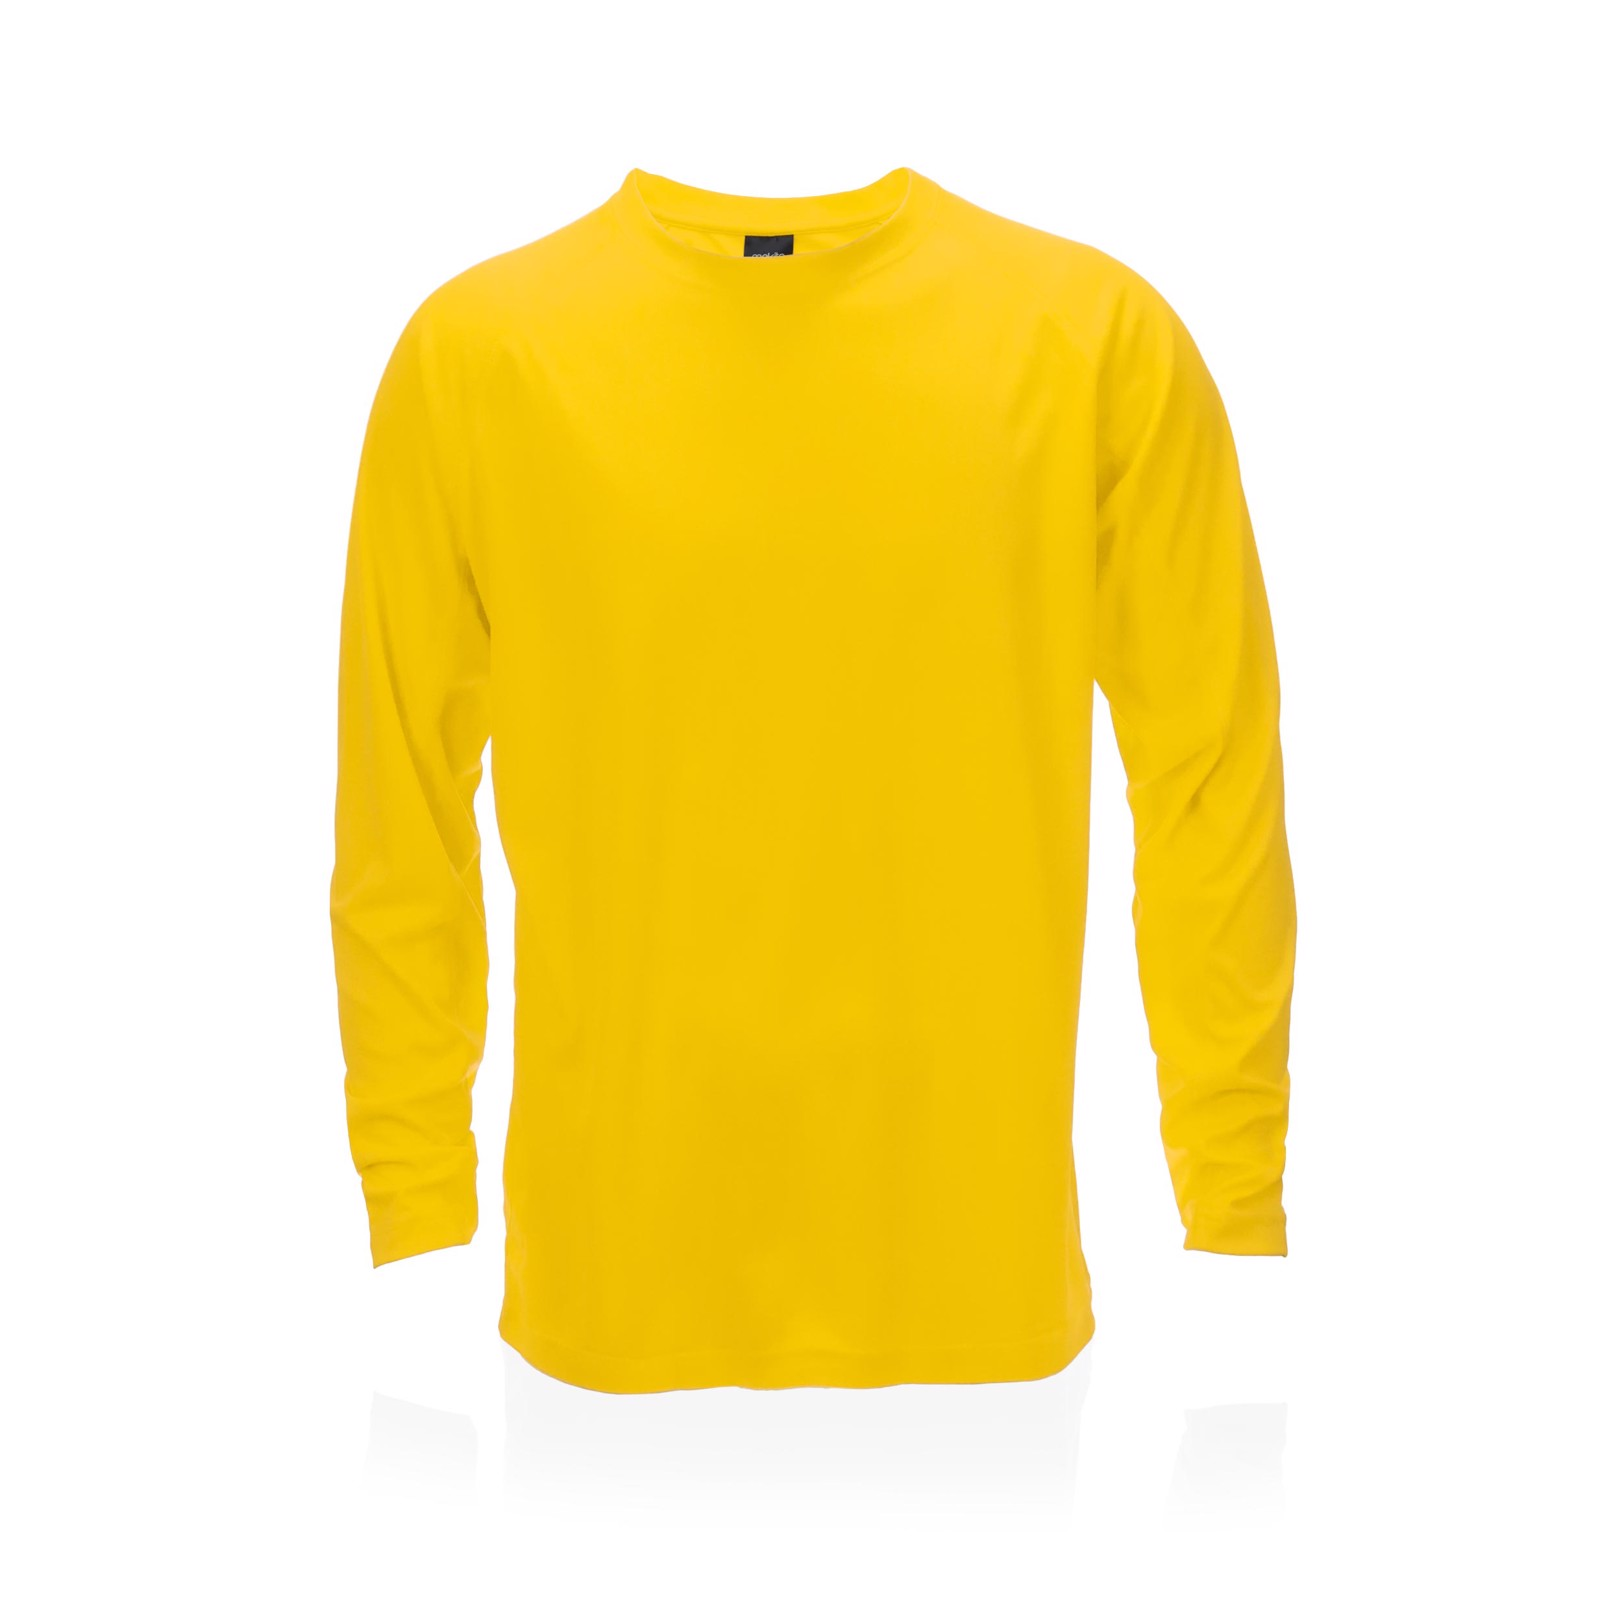 Camiseta Adulto Tecnik Maik - Amarillo / M